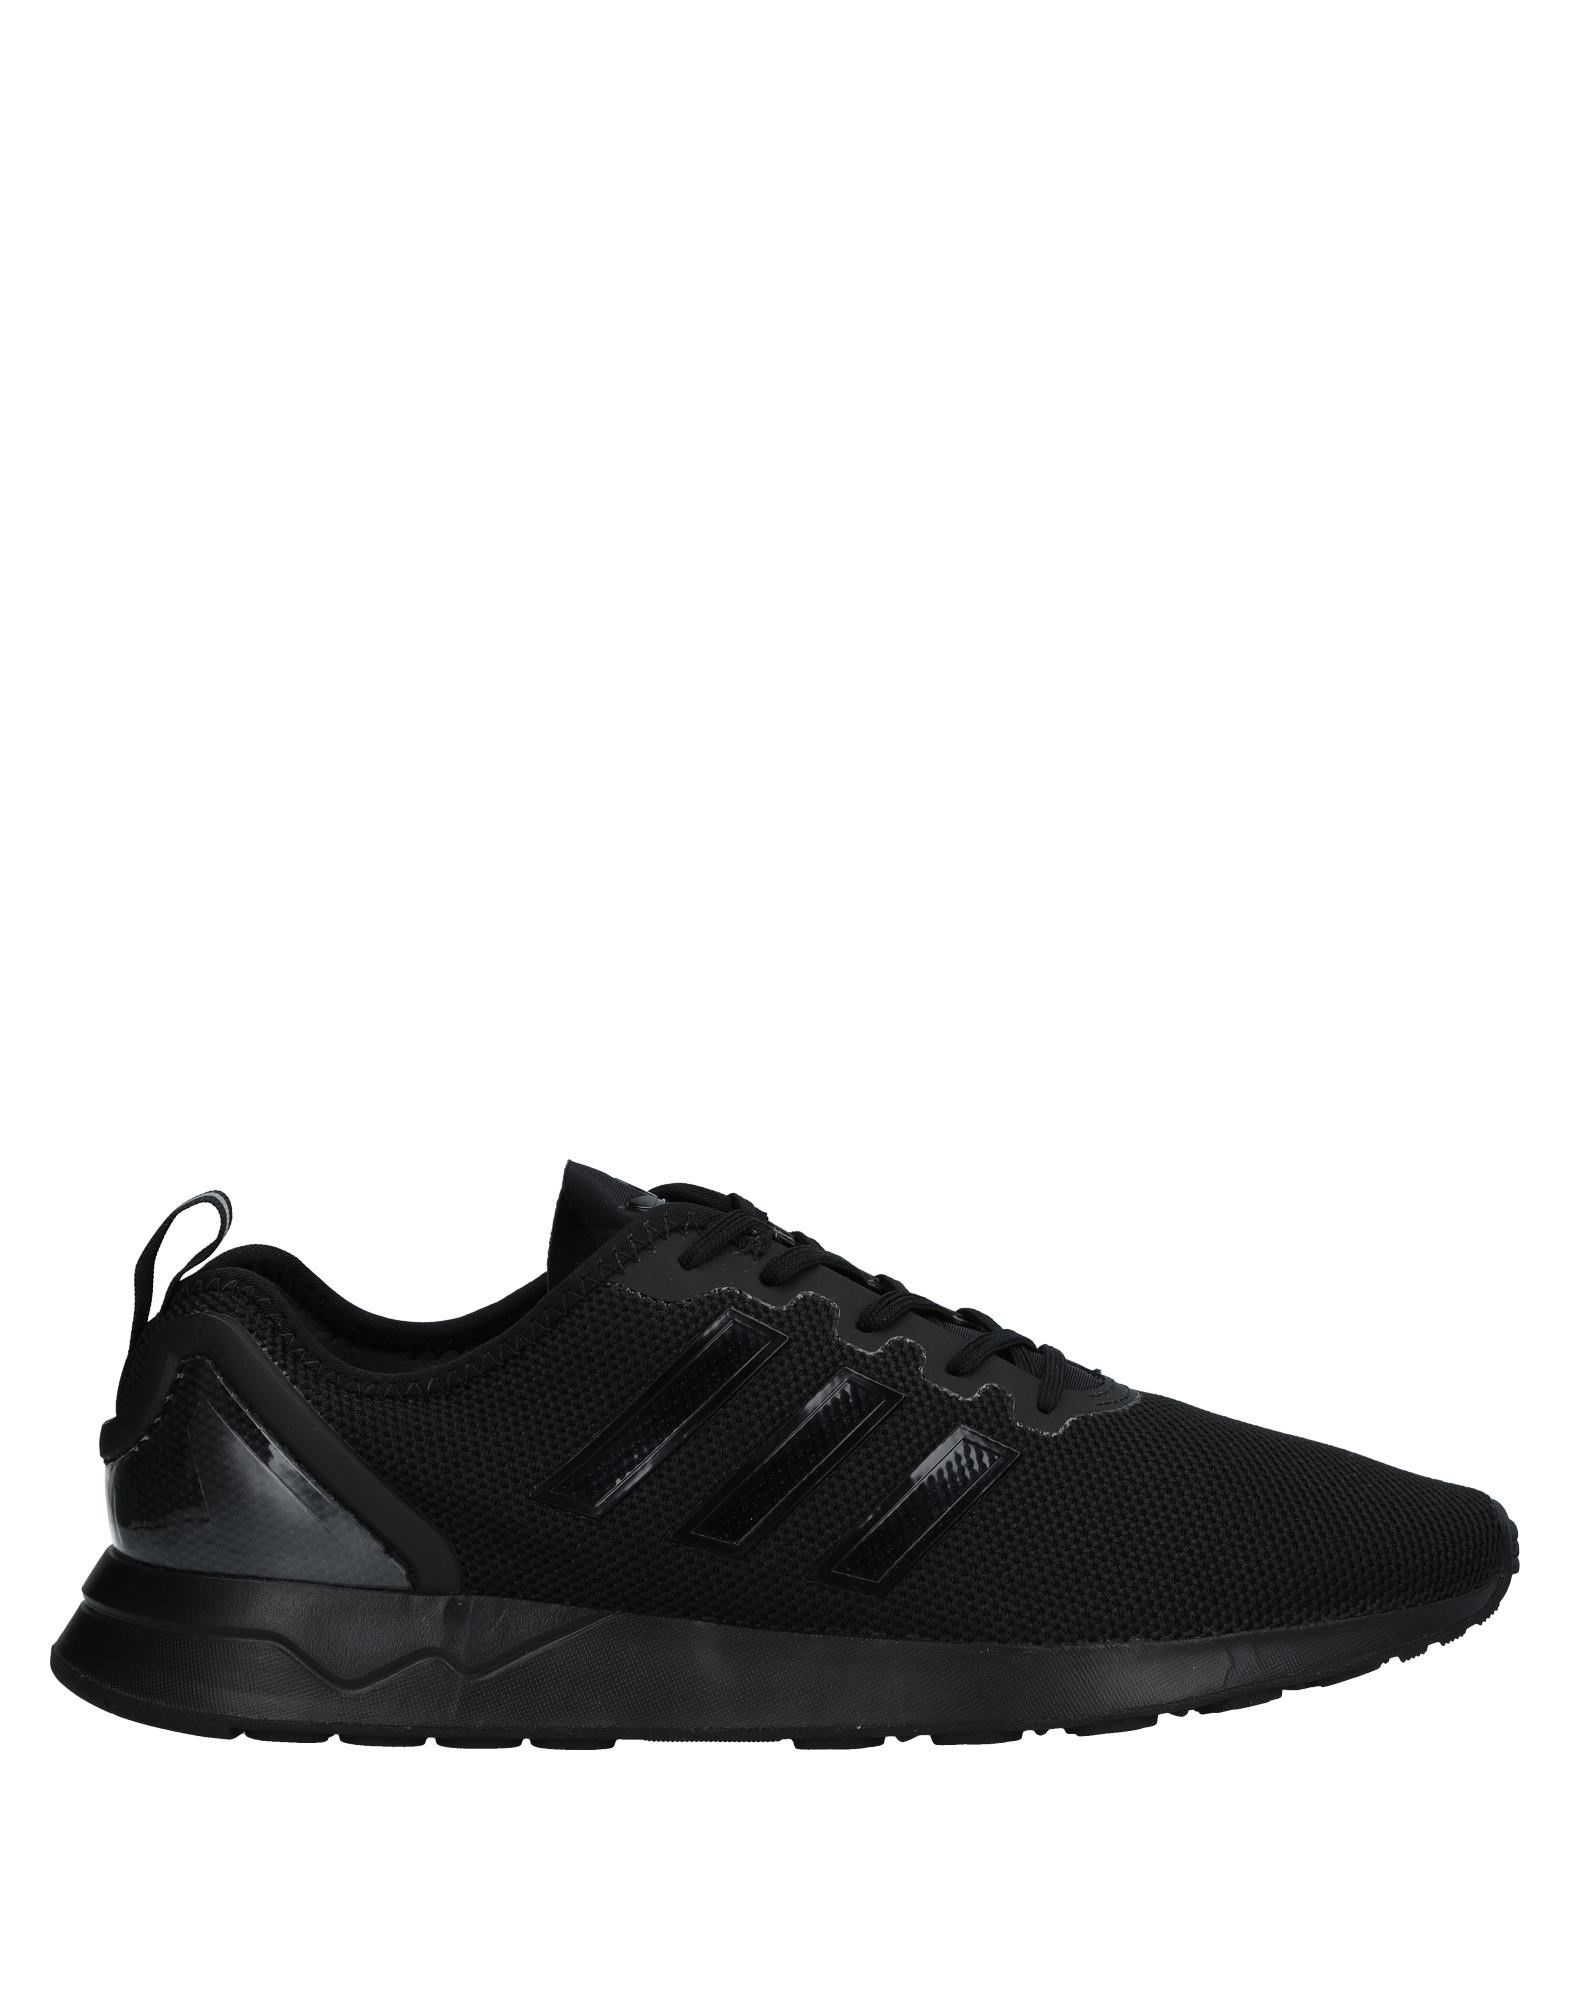 Adidas Originals Sneakers Herren Neue  11527850XH Neue Herren Schuhe f3829b